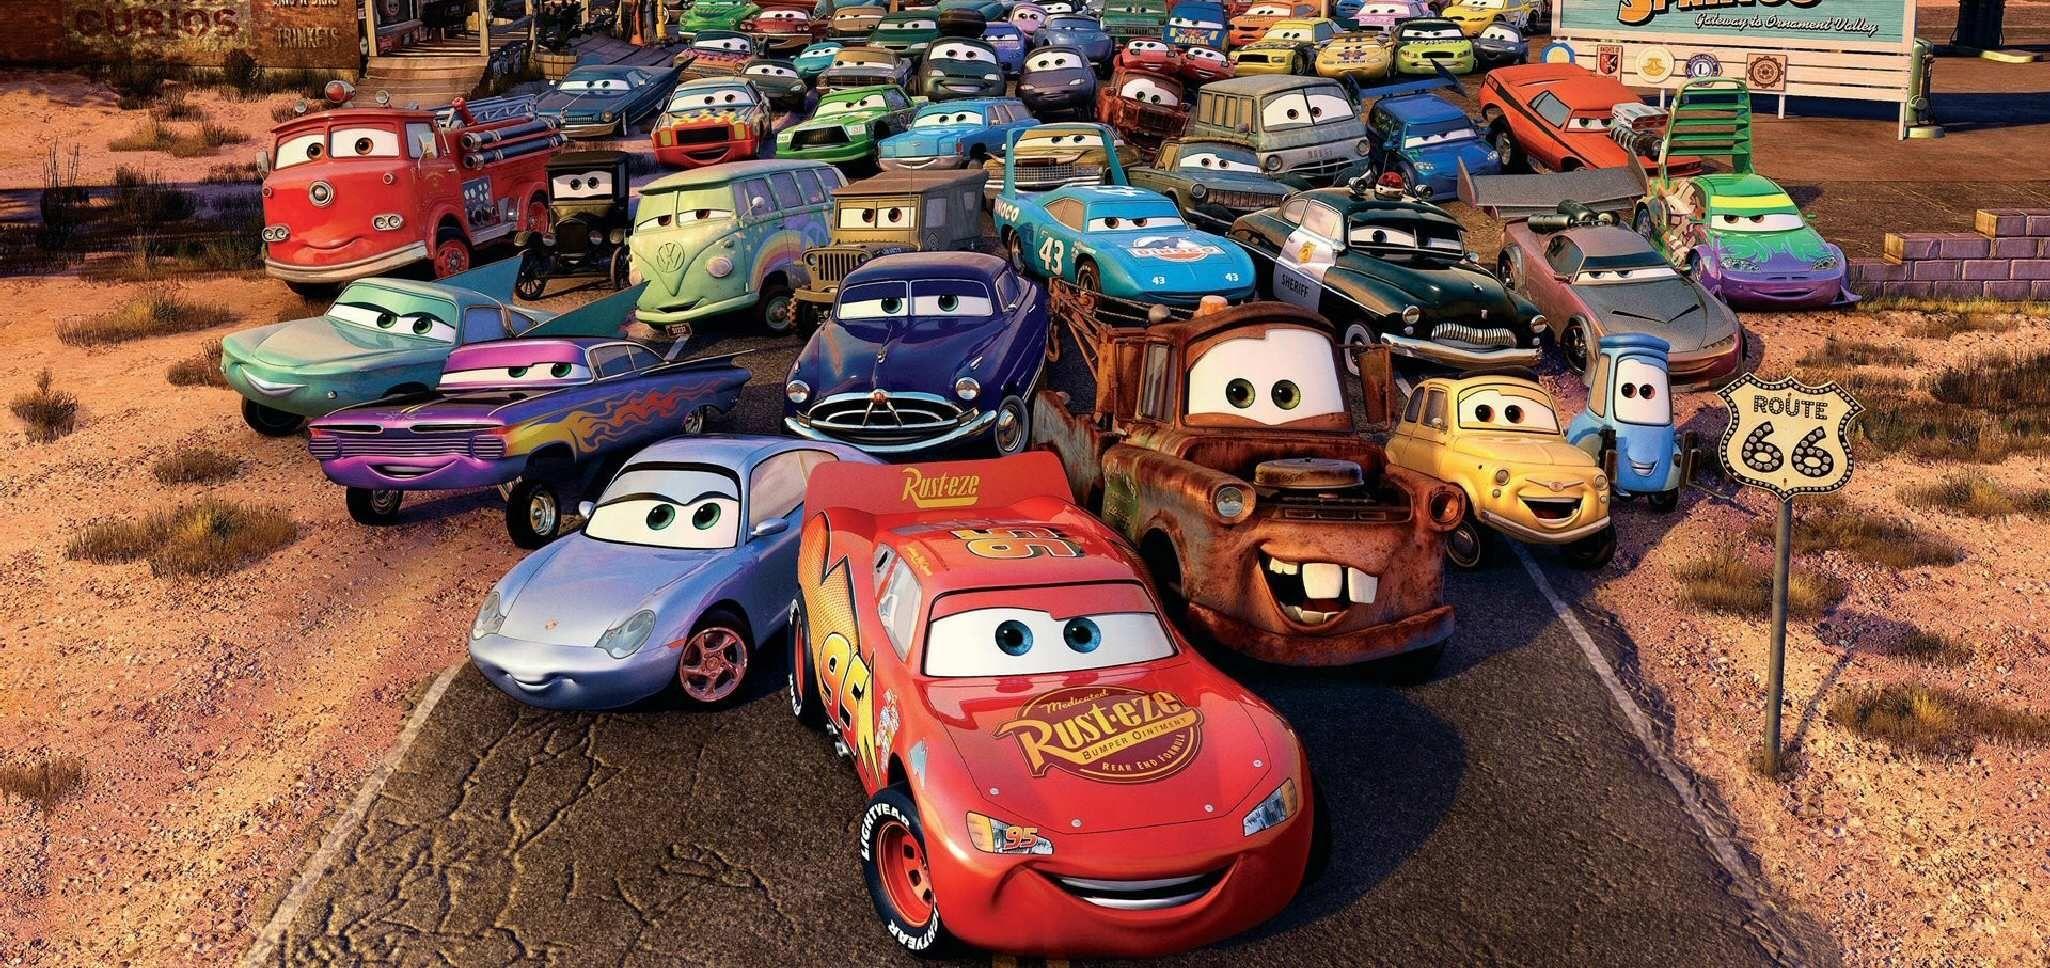 Kids N Fun Com Precious Moments Coloring Pages Cars 2006 Pixar Films Disney Pixar Movies